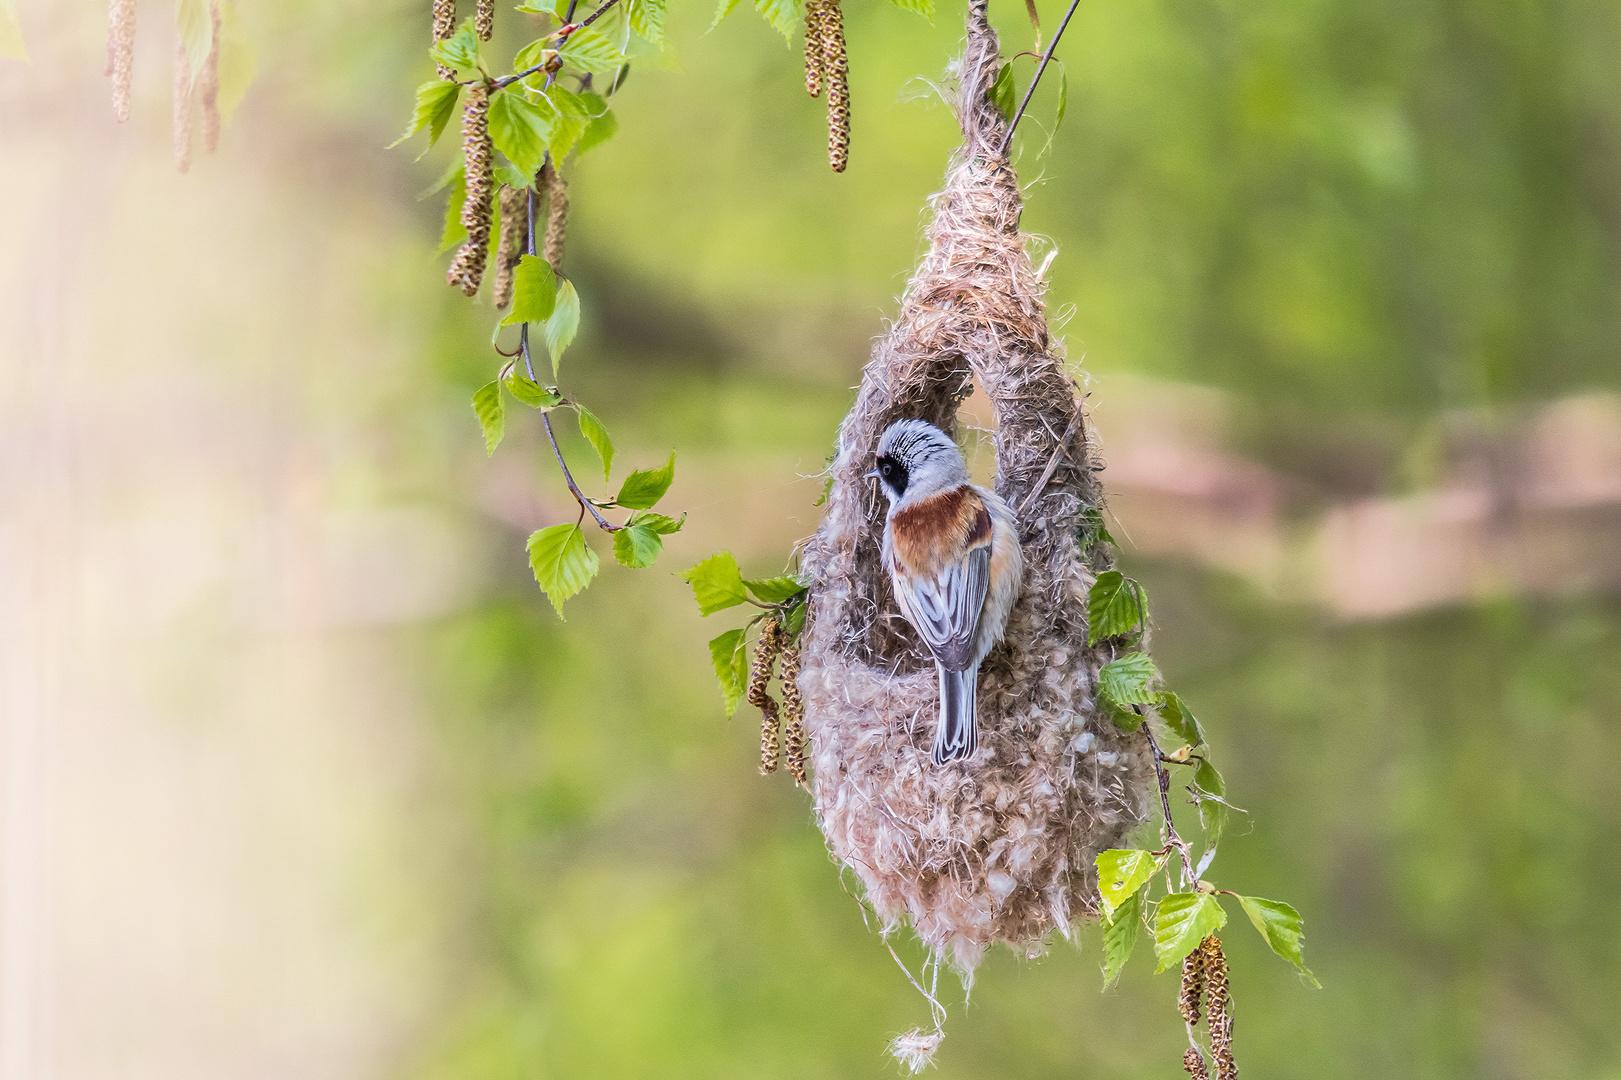 Beutelmeise am halbfertigen Nest